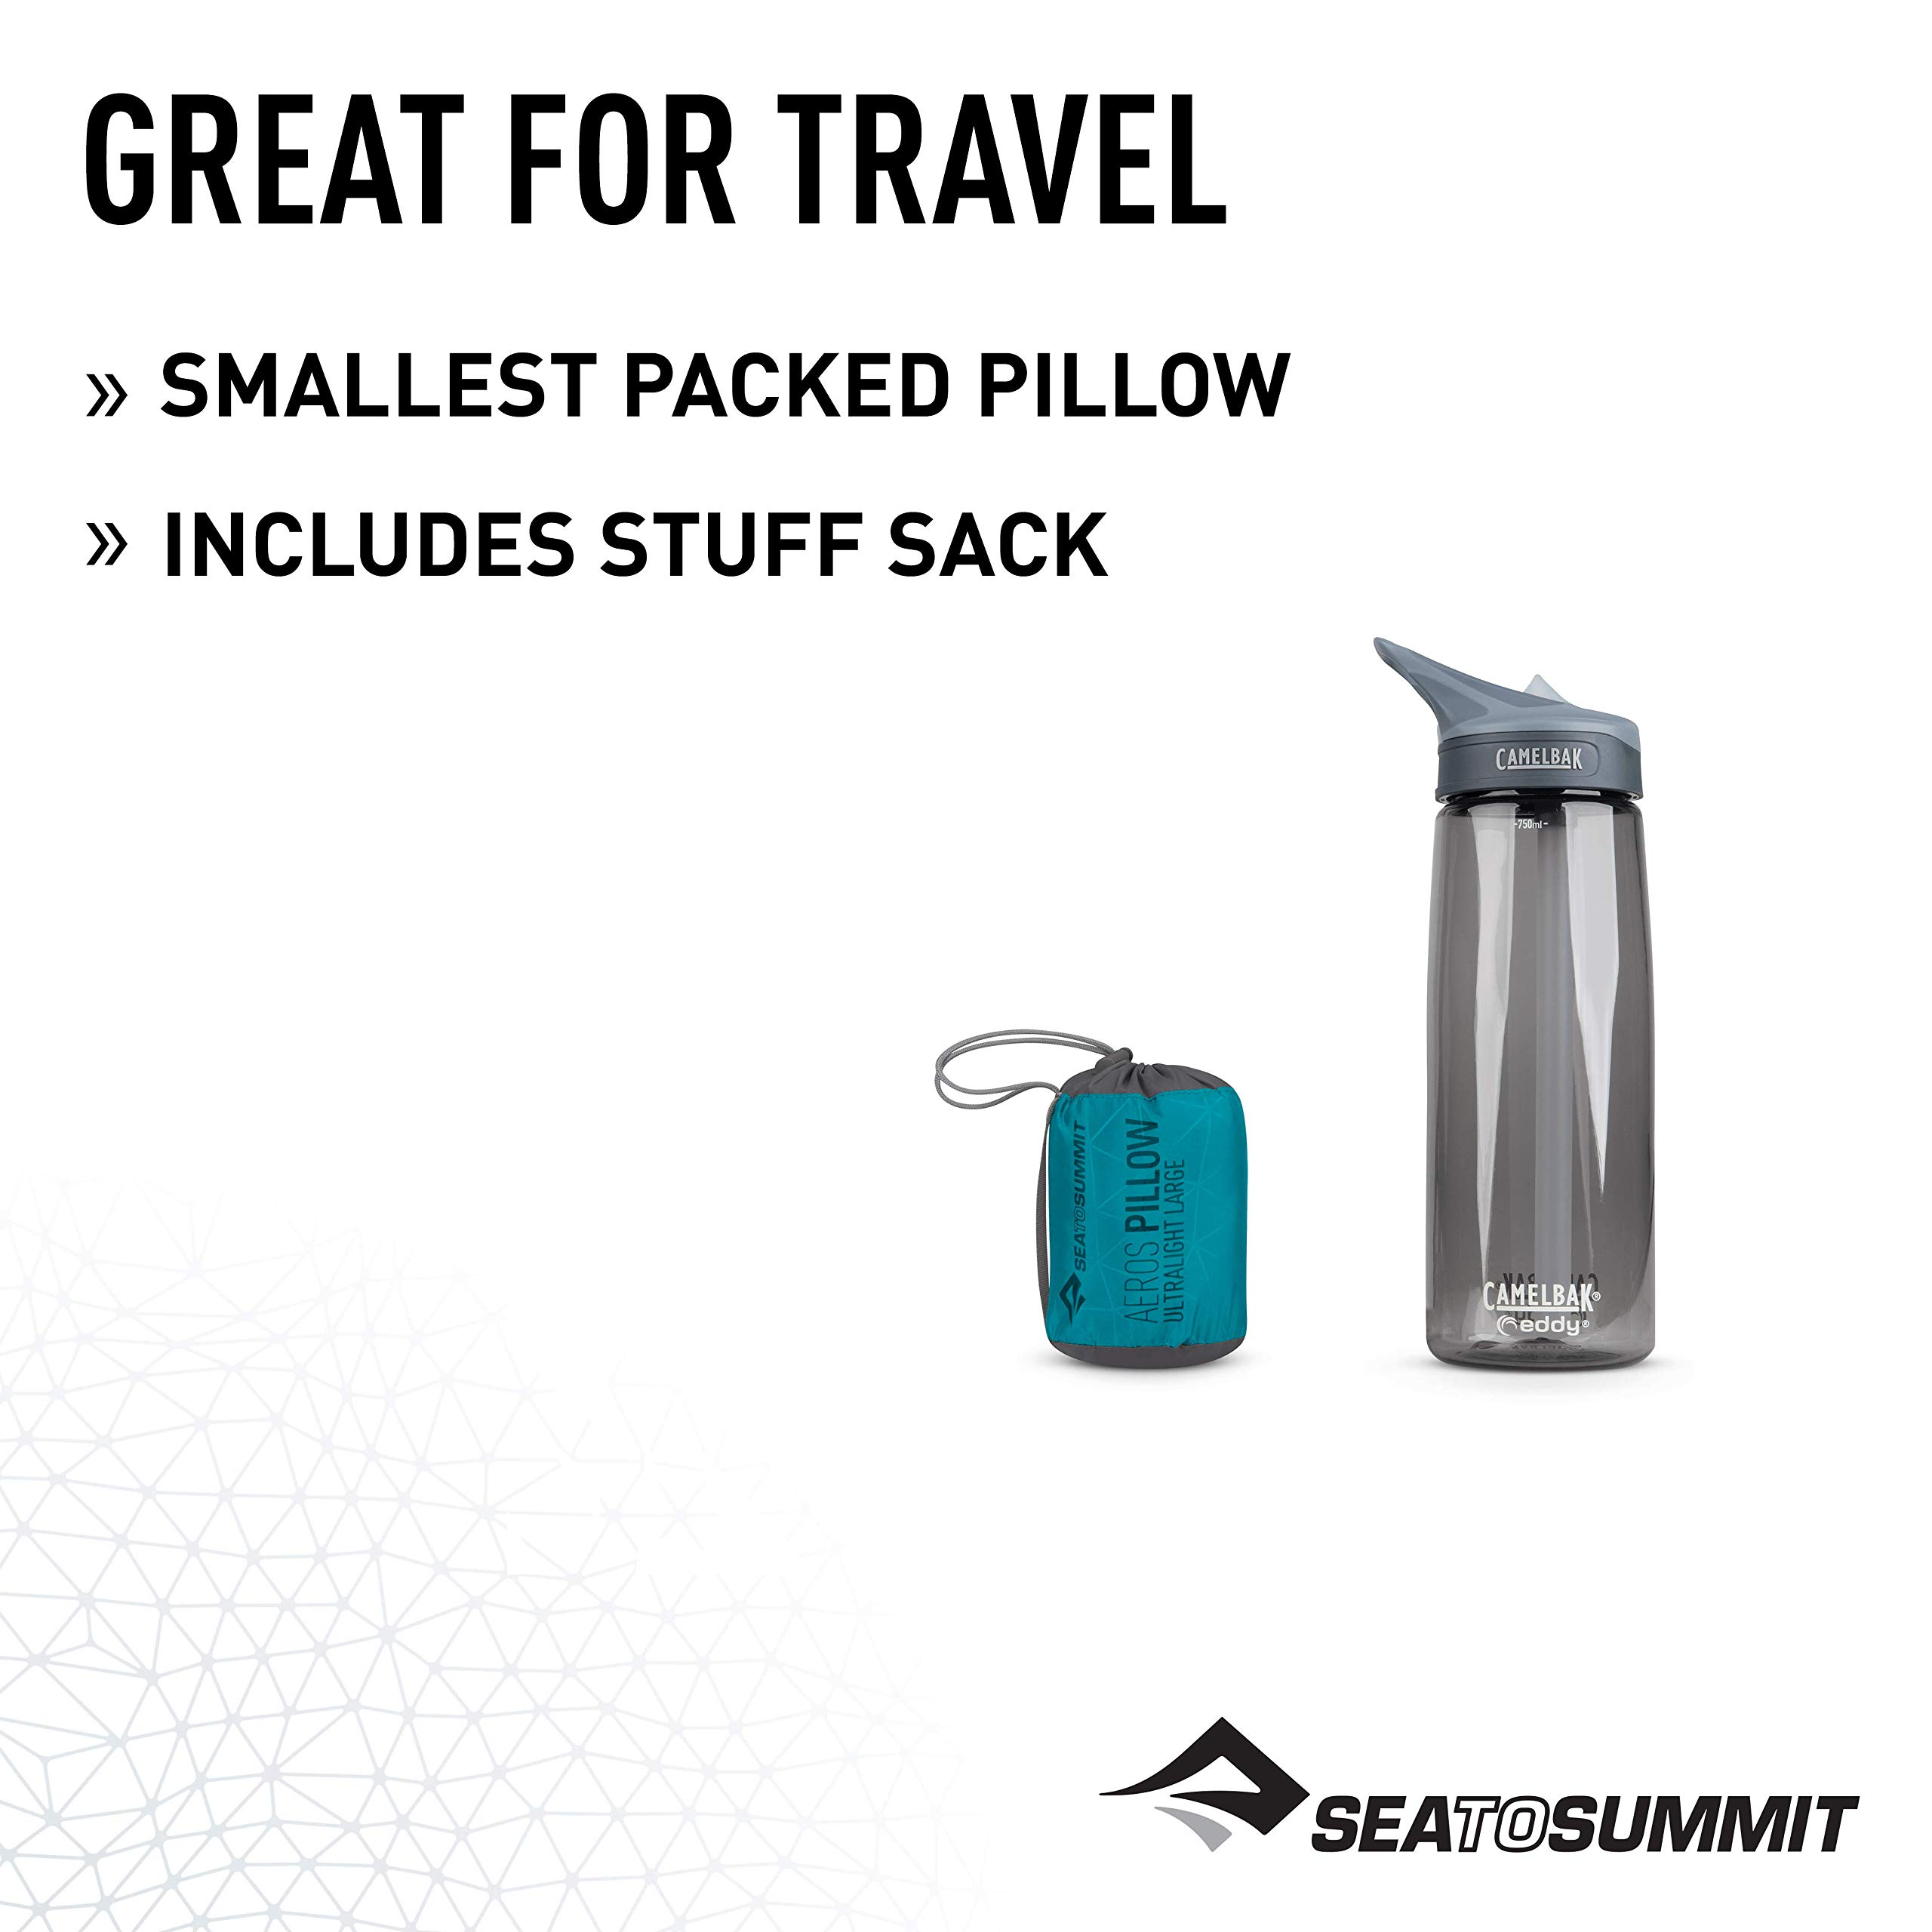 Sea to Summit Aeros Ultralight Pillow Large Inflatable Travel Pillow, 574, Aqua Blue